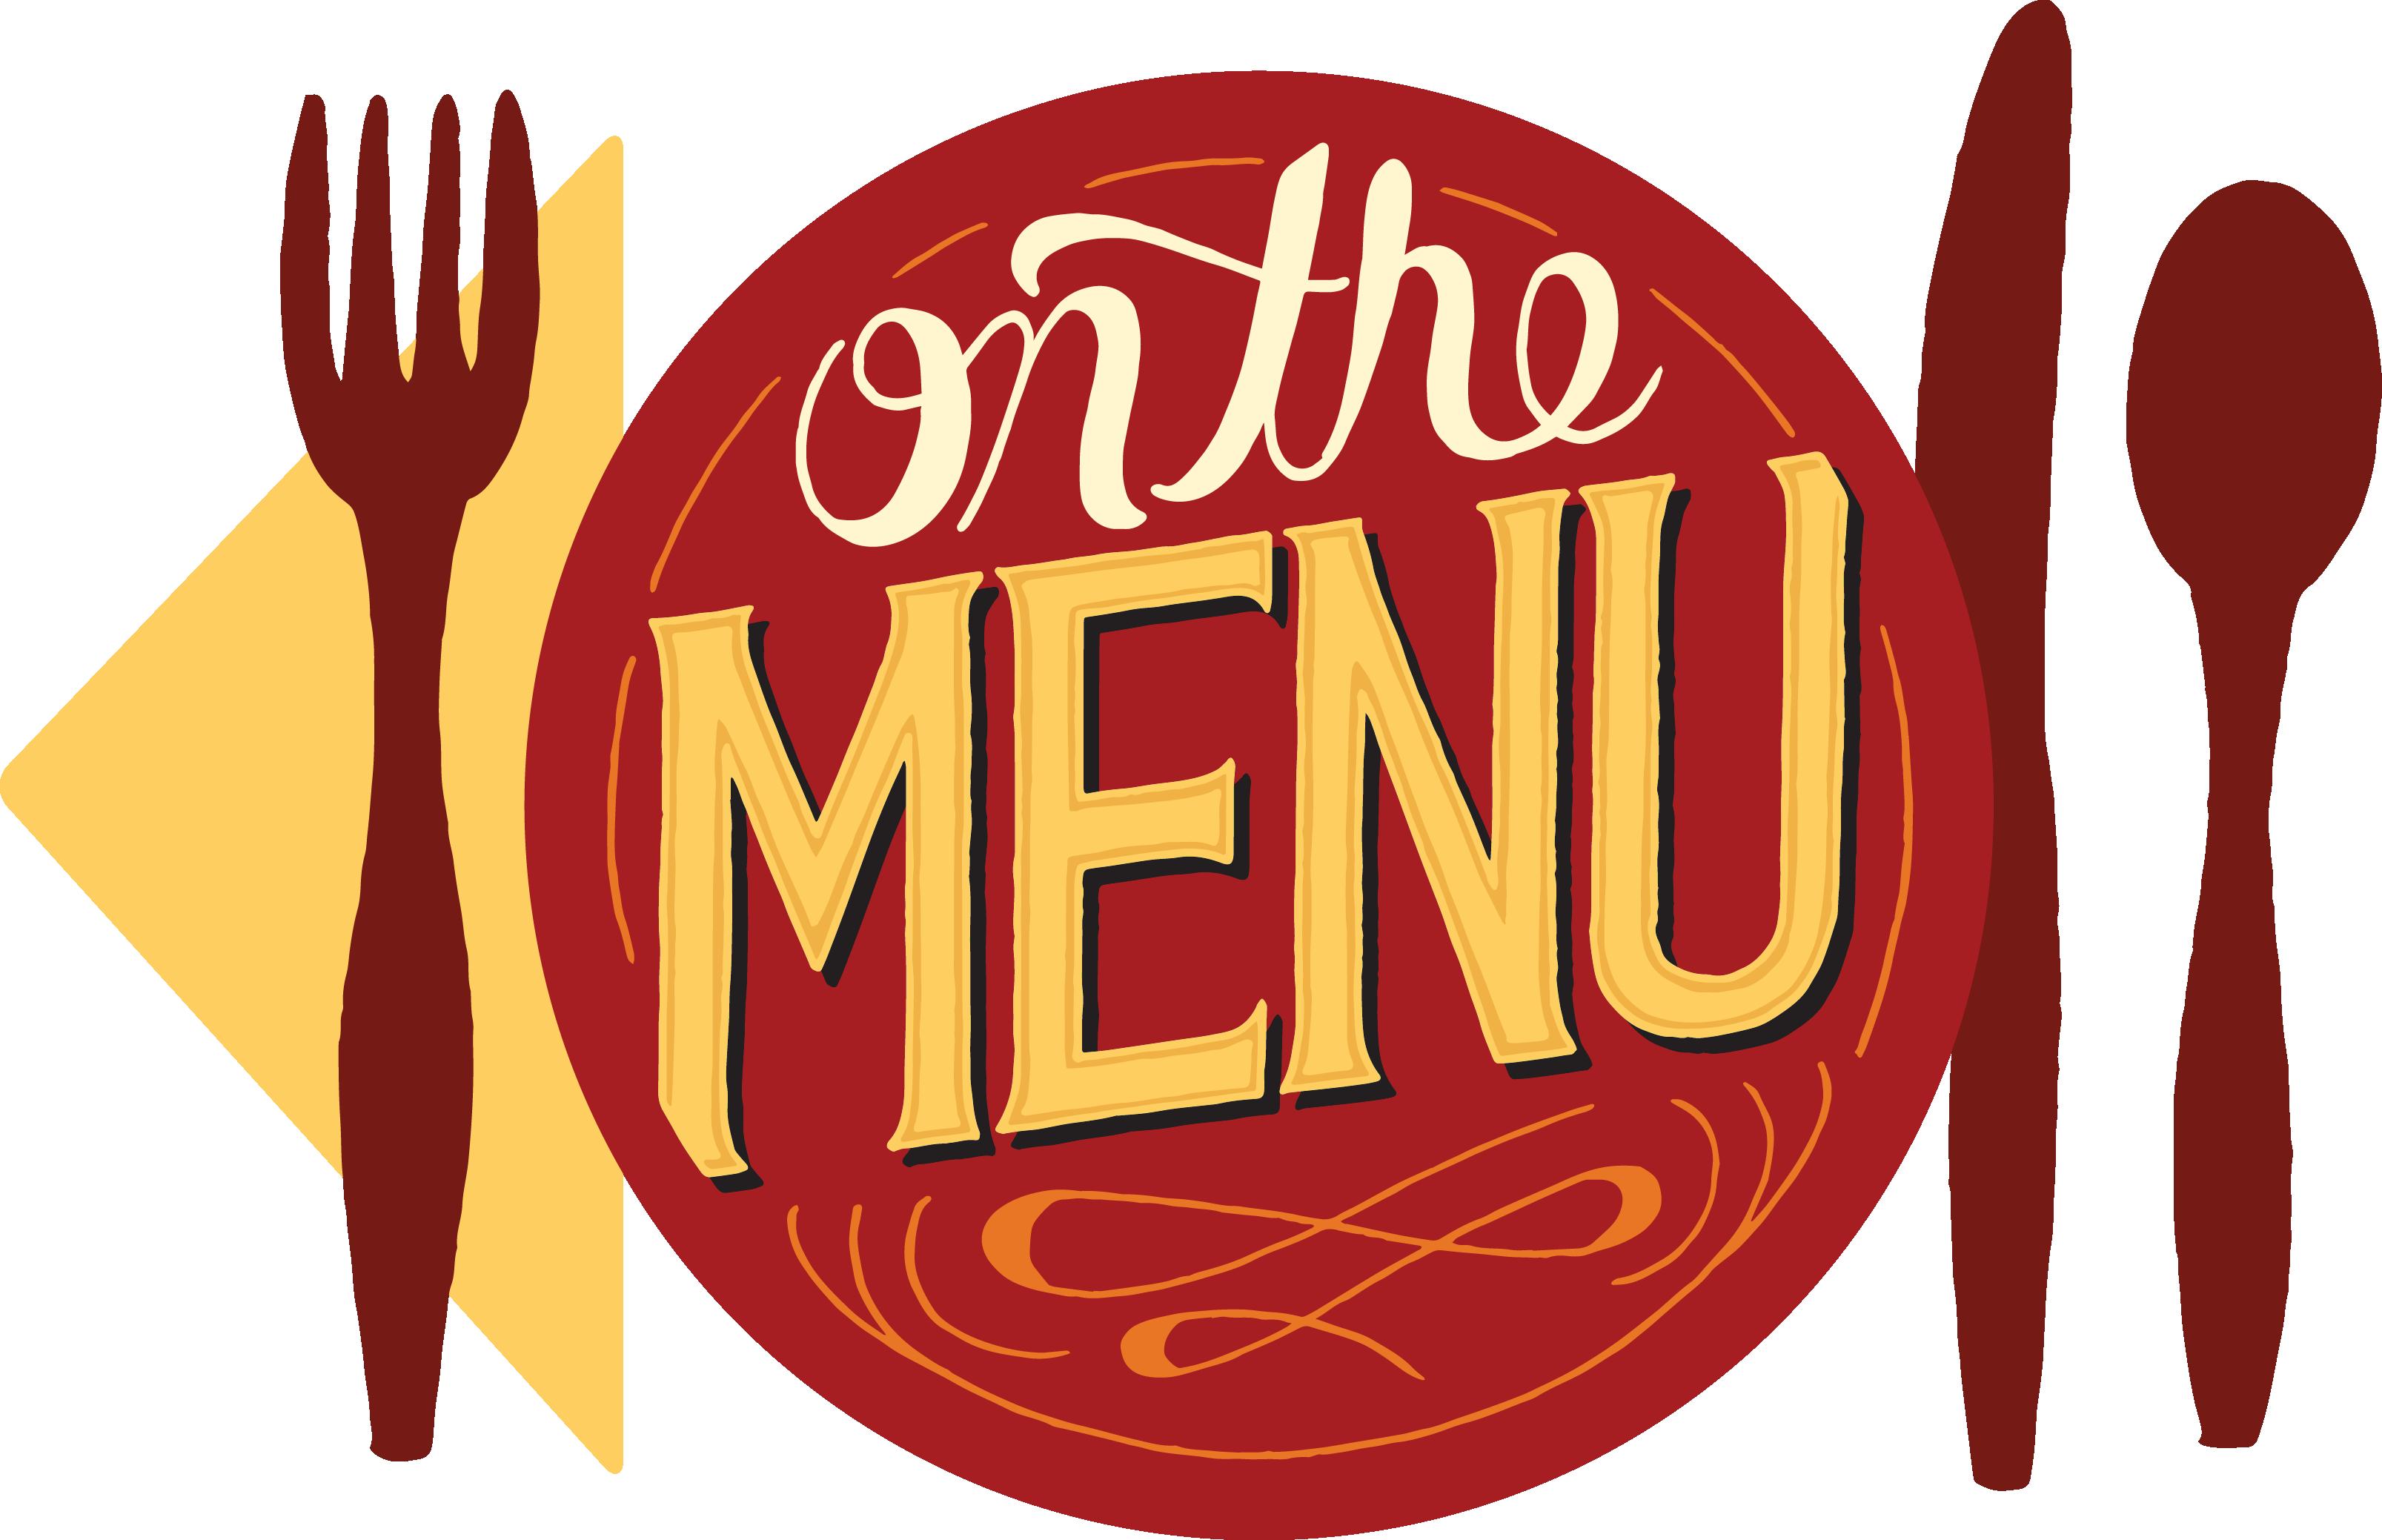 On the menu